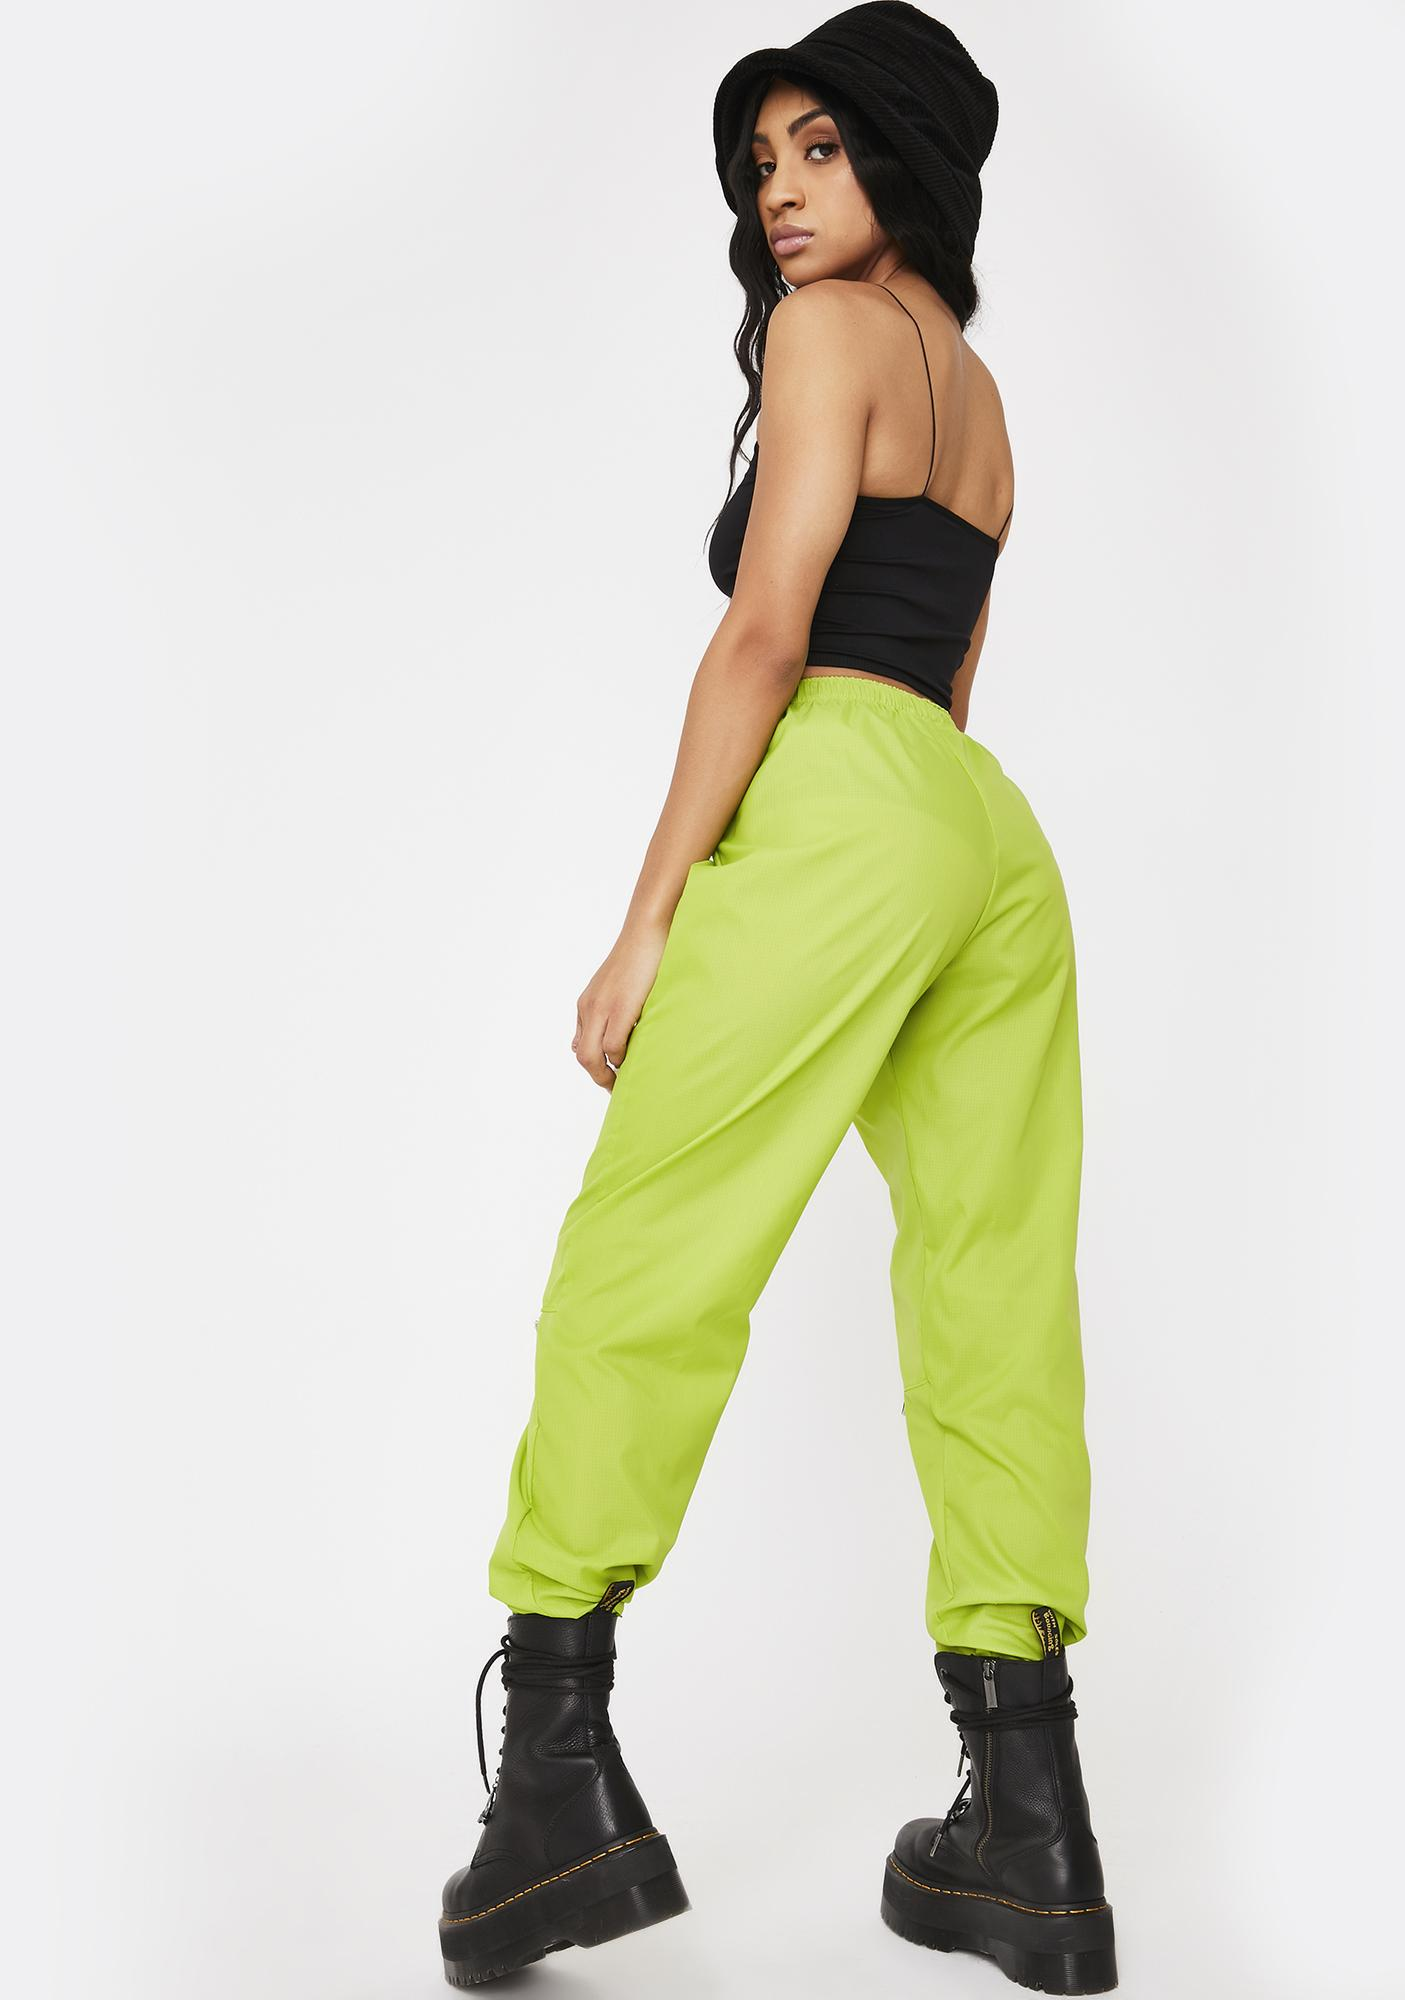 Riccetti Clothing Lime Green Liberty Windbreaker Pants